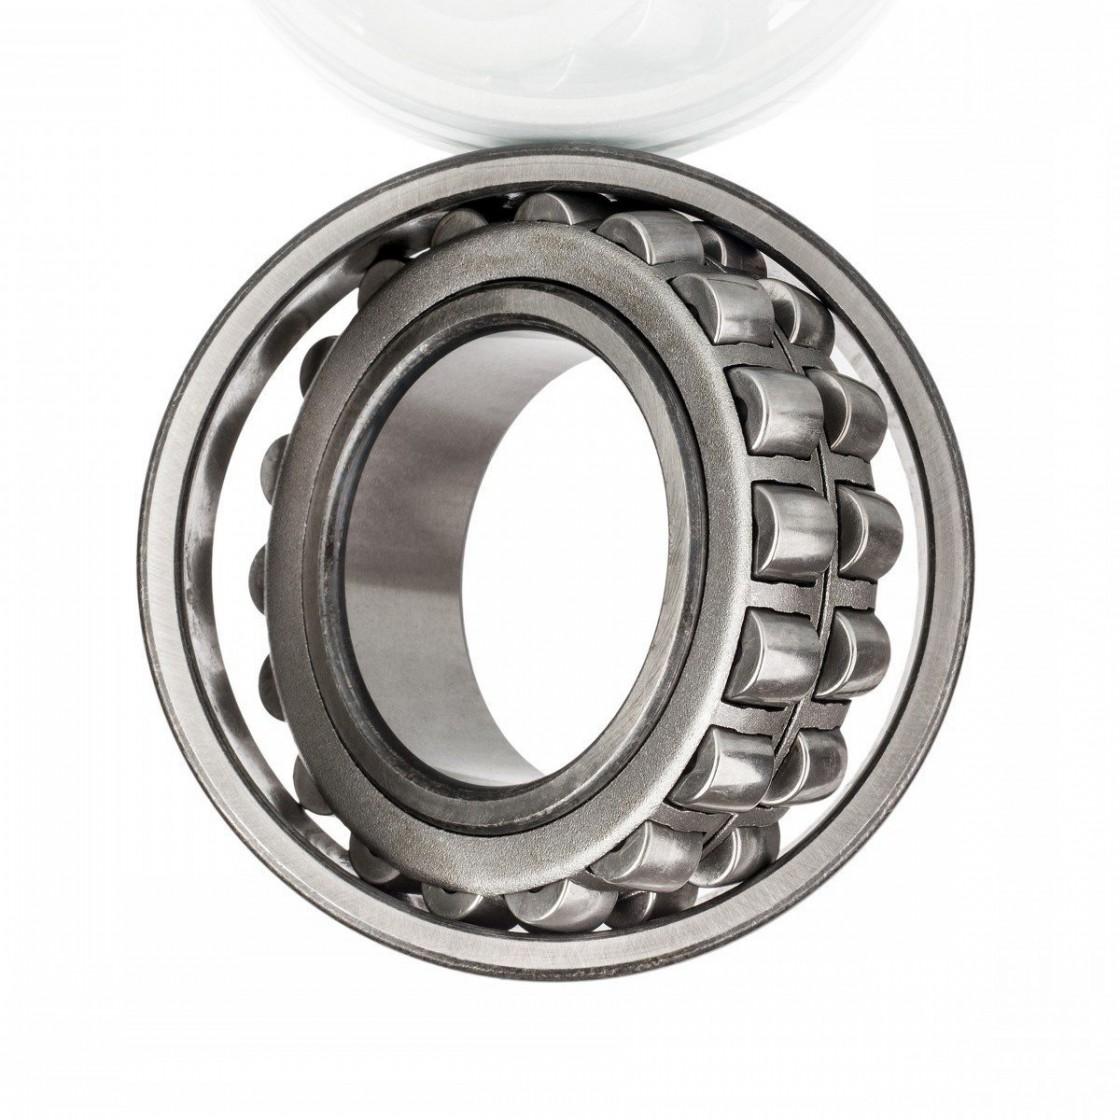 NSK 95dsf01 Deep Groove Ball Bearing 90363-95003 Automotive Bearing